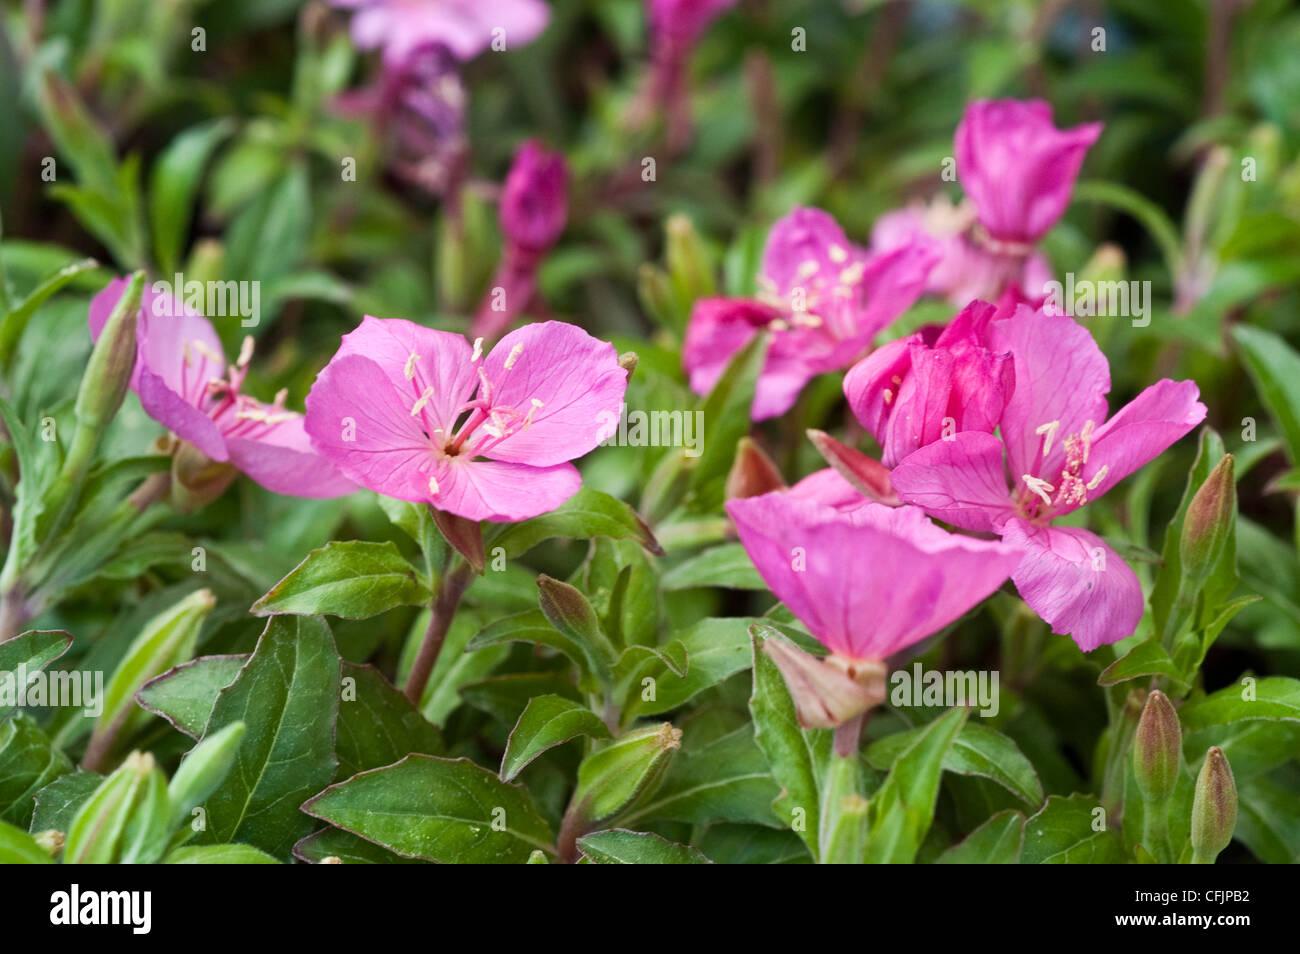 Pink magenta flowers of Oenothera Glowing Magenta - Stock Image